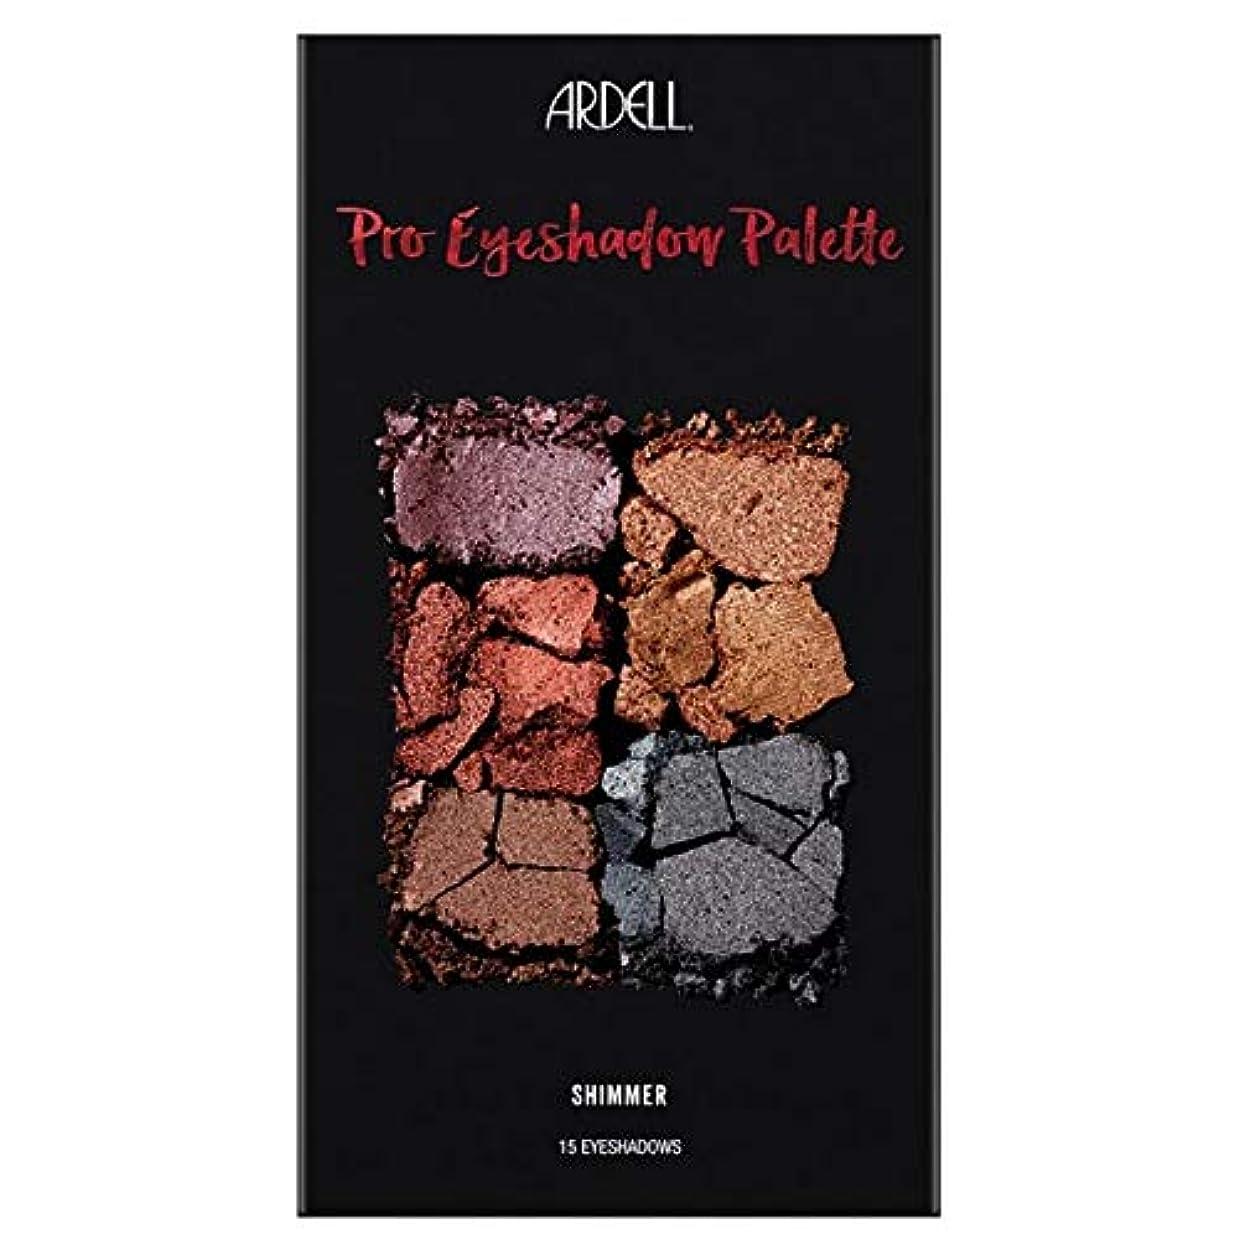 [Ardell] Ardell美のプロアイシャドウパレットきらめき - Ardell Beauty Pro Eyeshadow Palette Shimmer [並行輸入品]